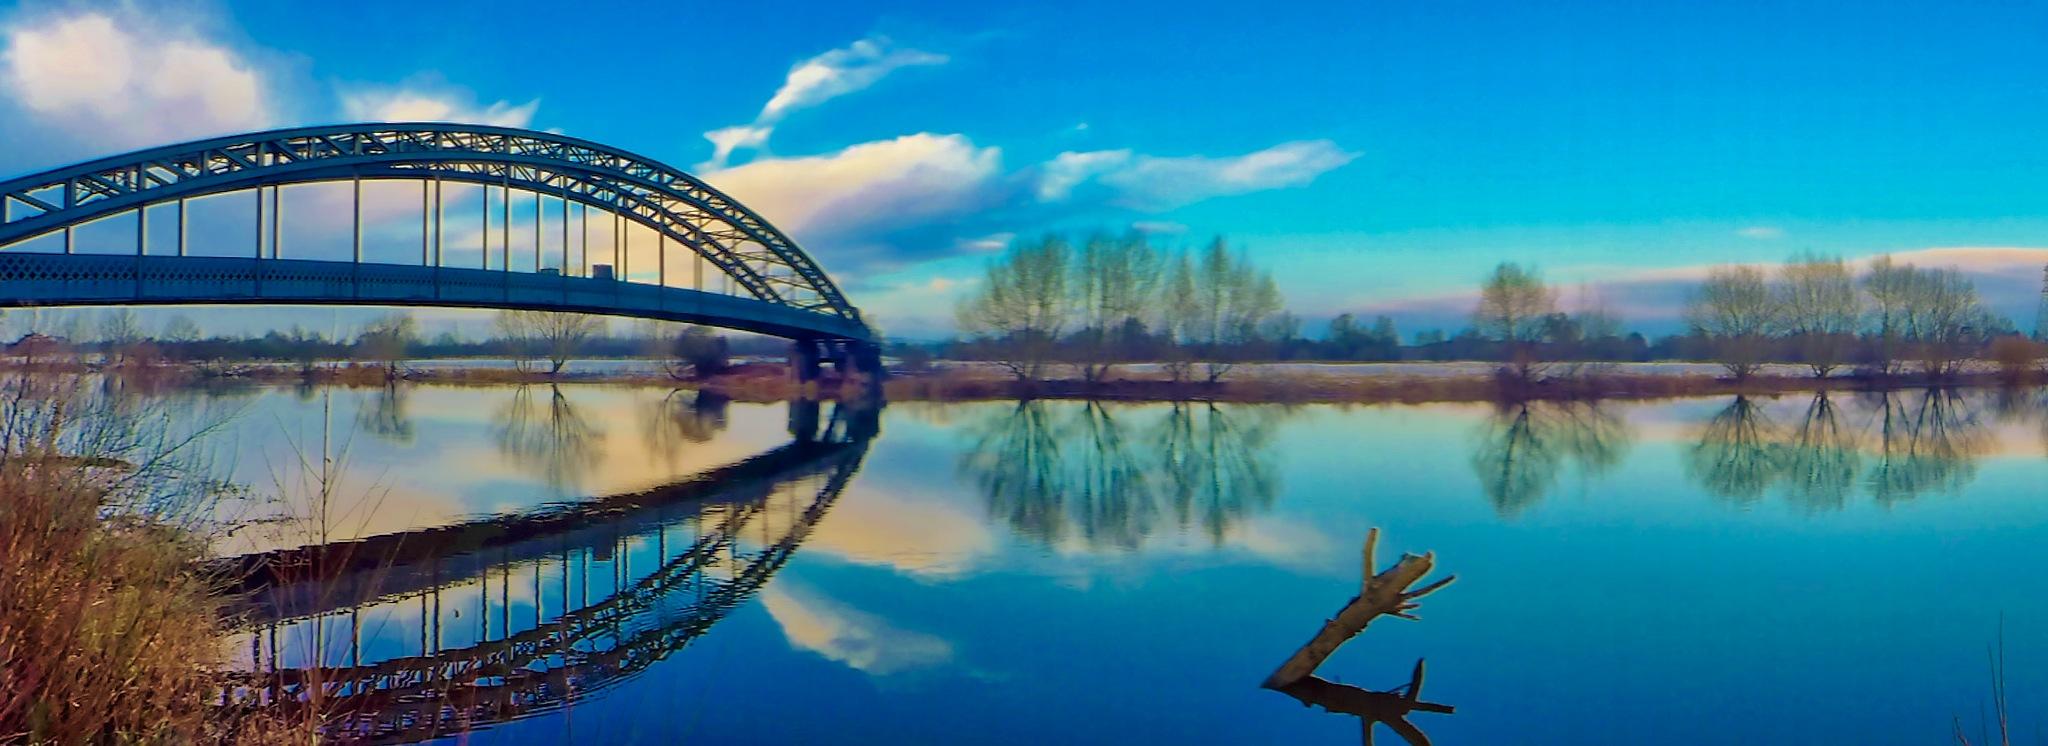 Aquaduct smooth hdr by AJ Yakstrangler Andy Jamieson